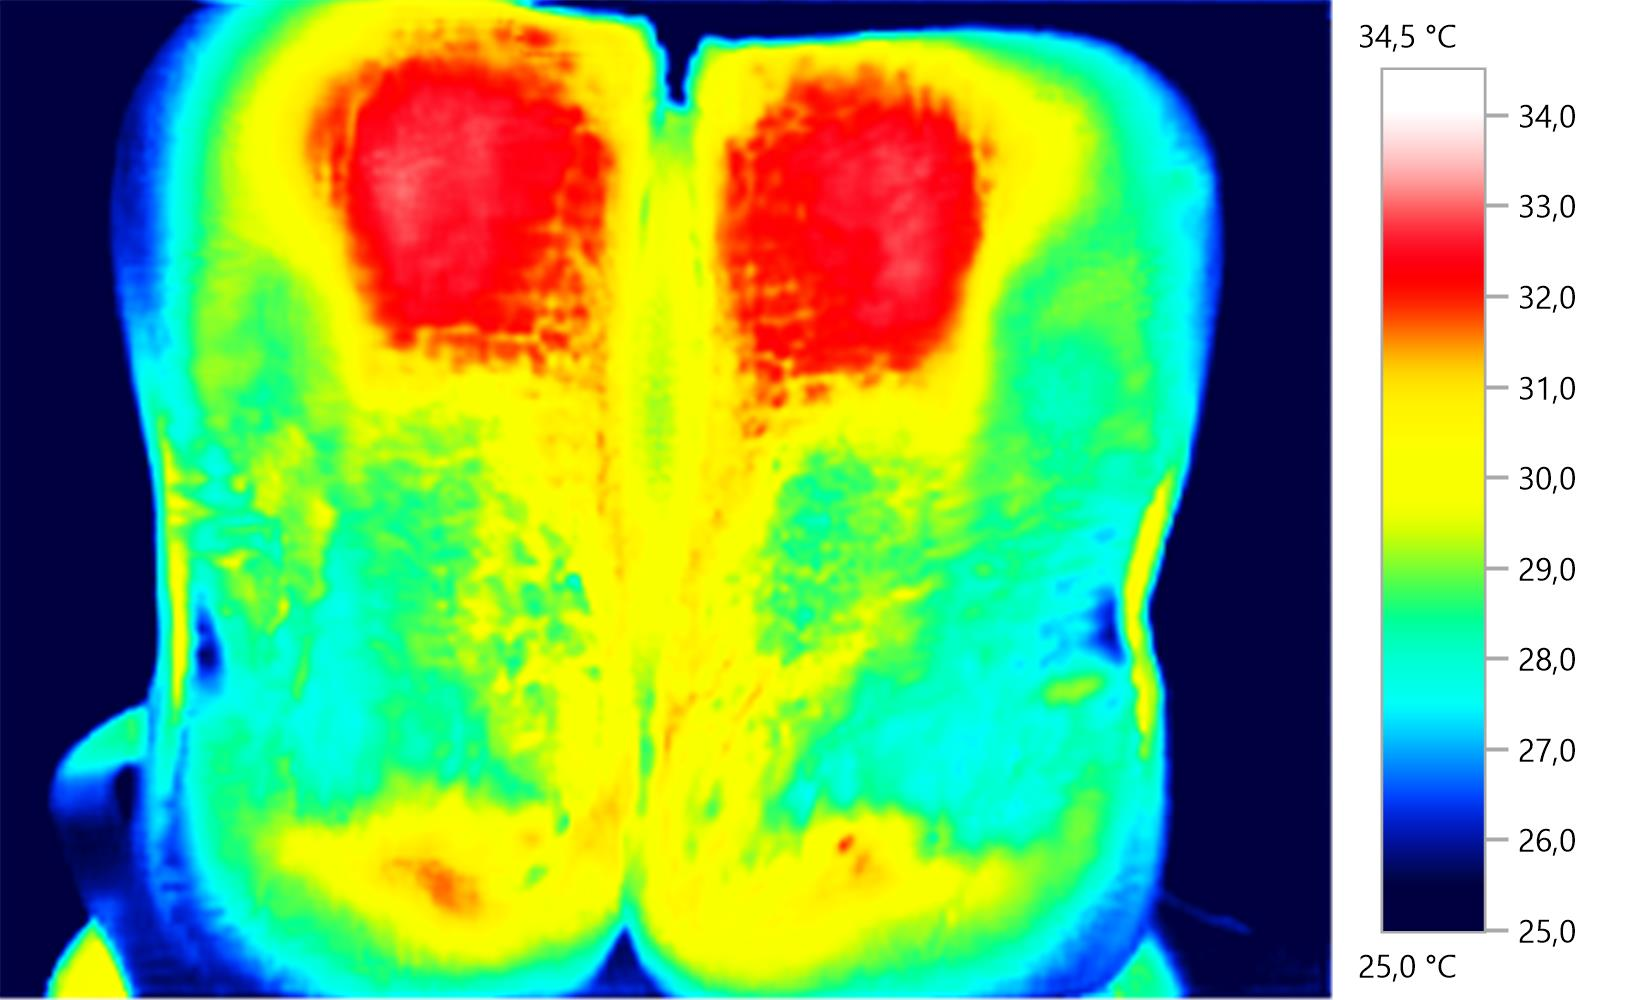 Sattelthermografie-Baumlossattel